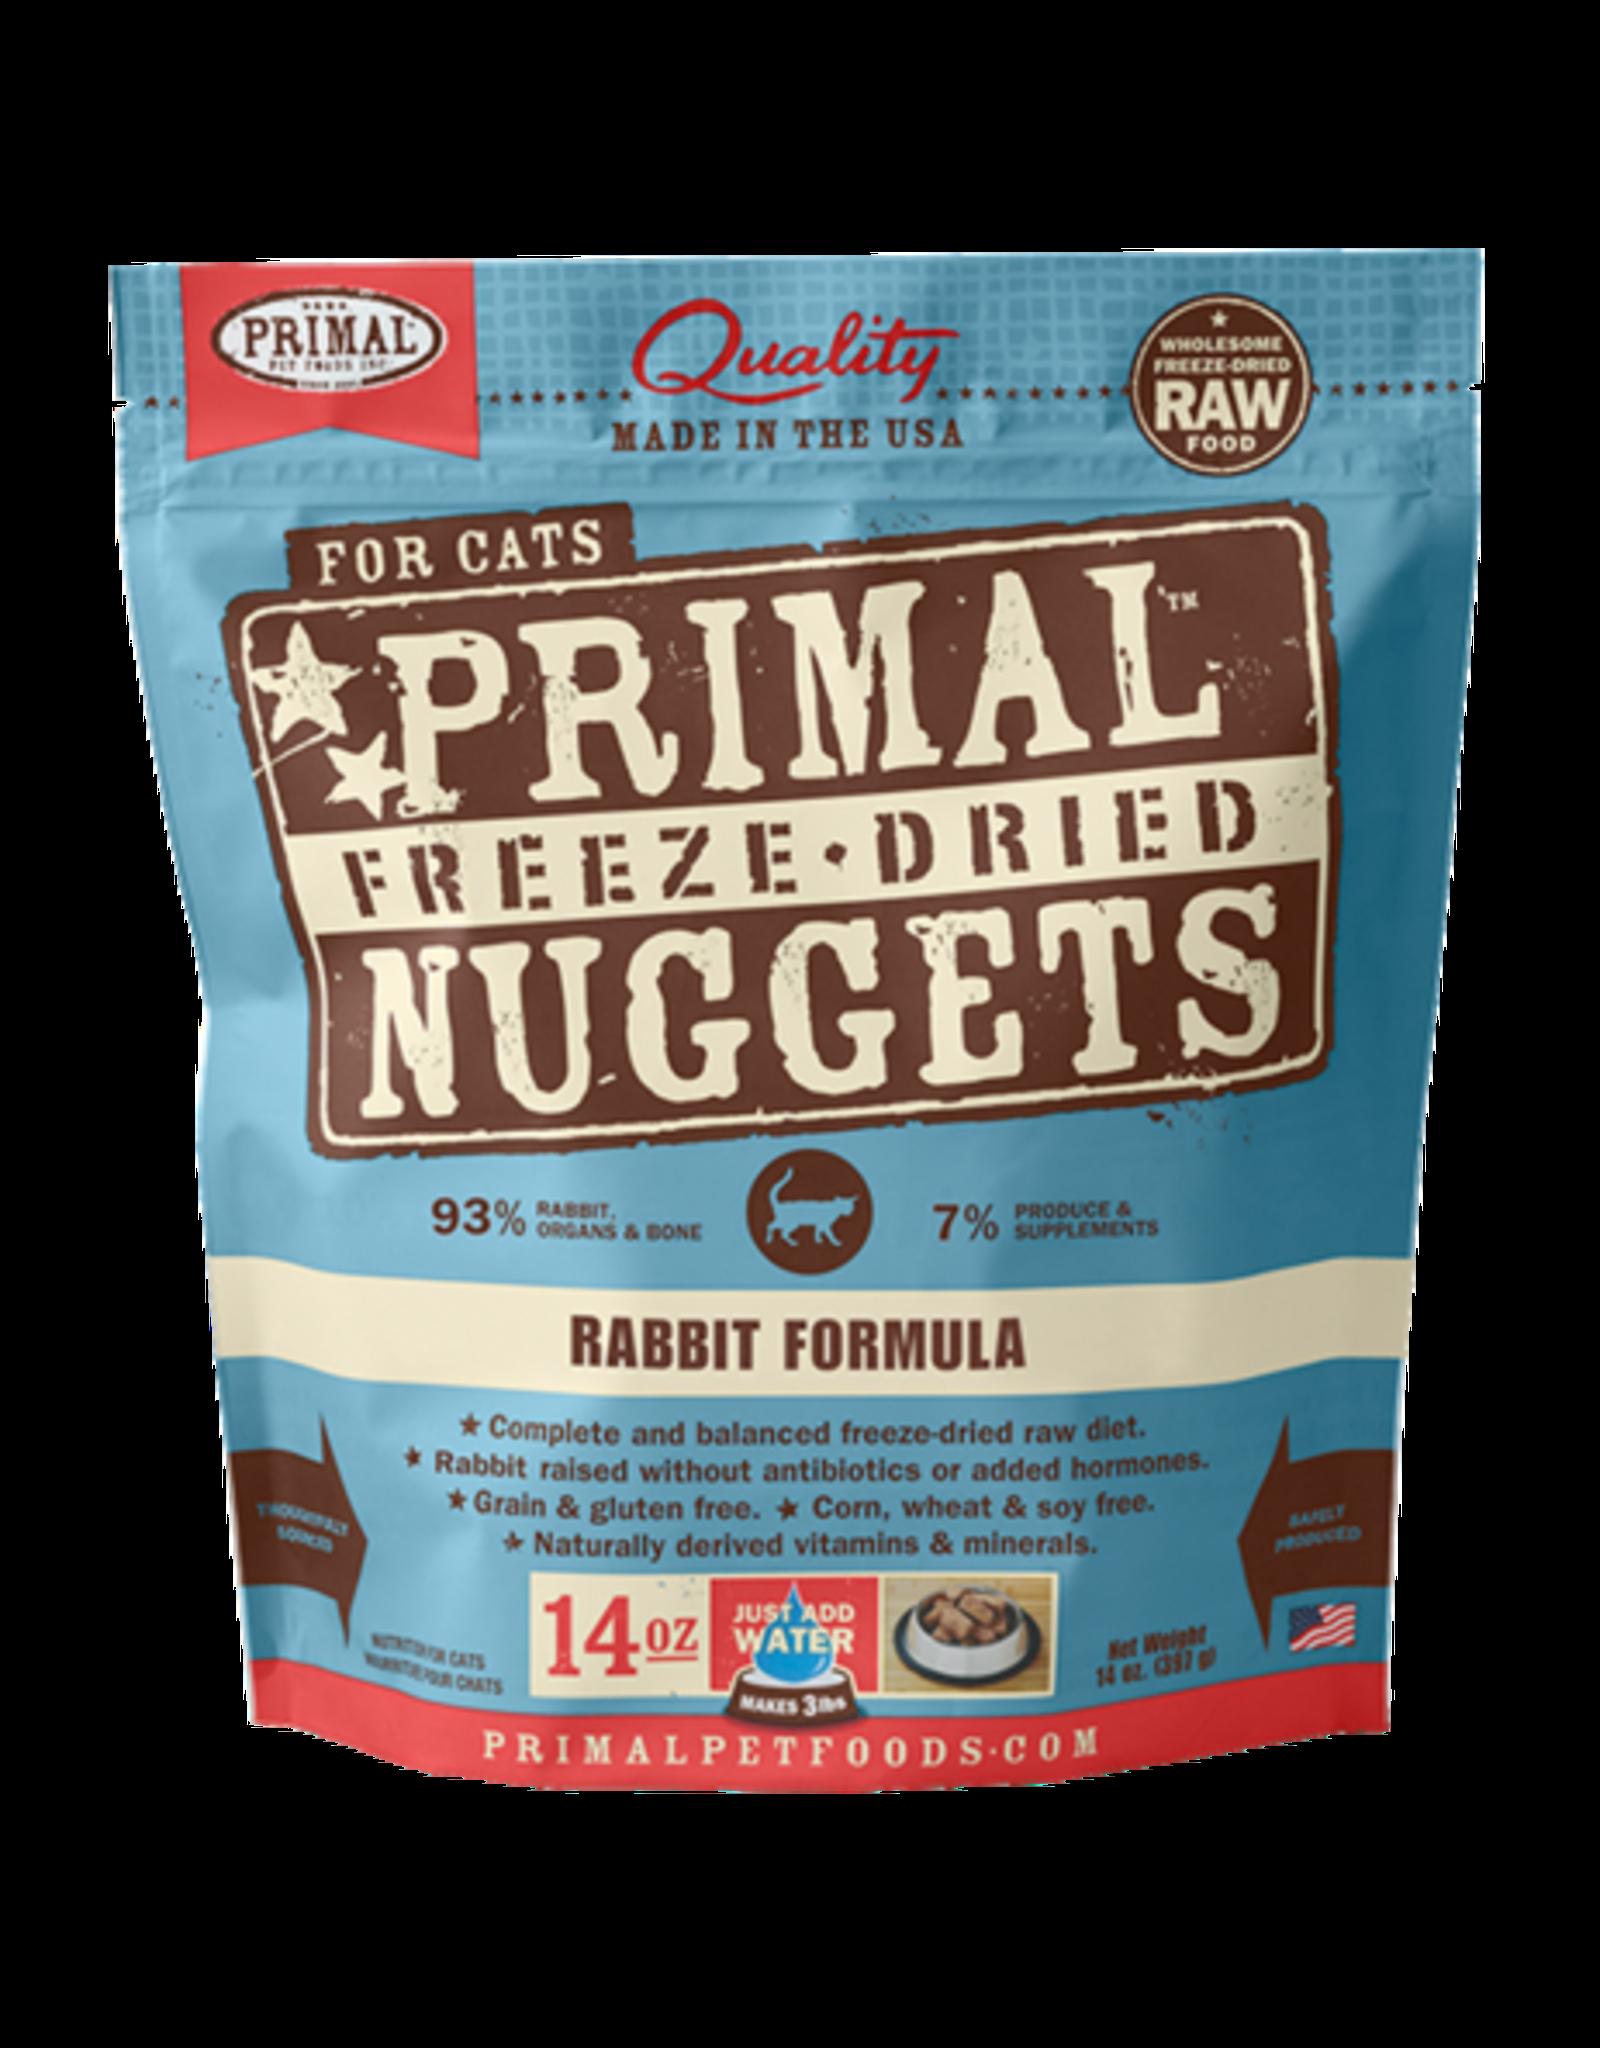 Primal Primal Freeze-Dried Feline Rabbit